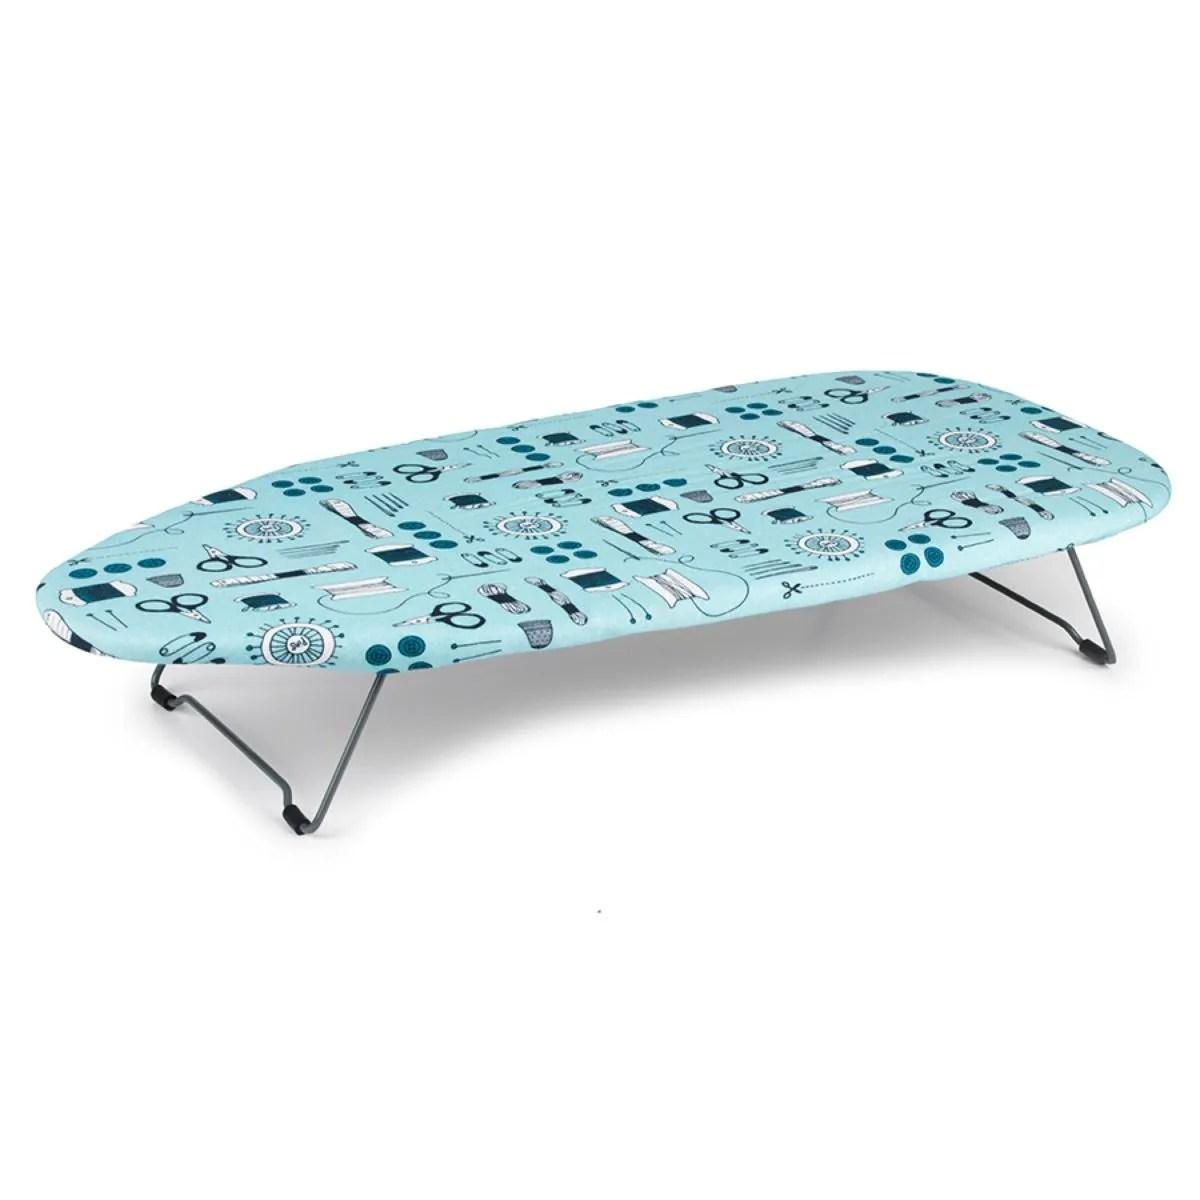 Sewing Print 73 X 33cm Tabletop Ironing Board Robert Dyas